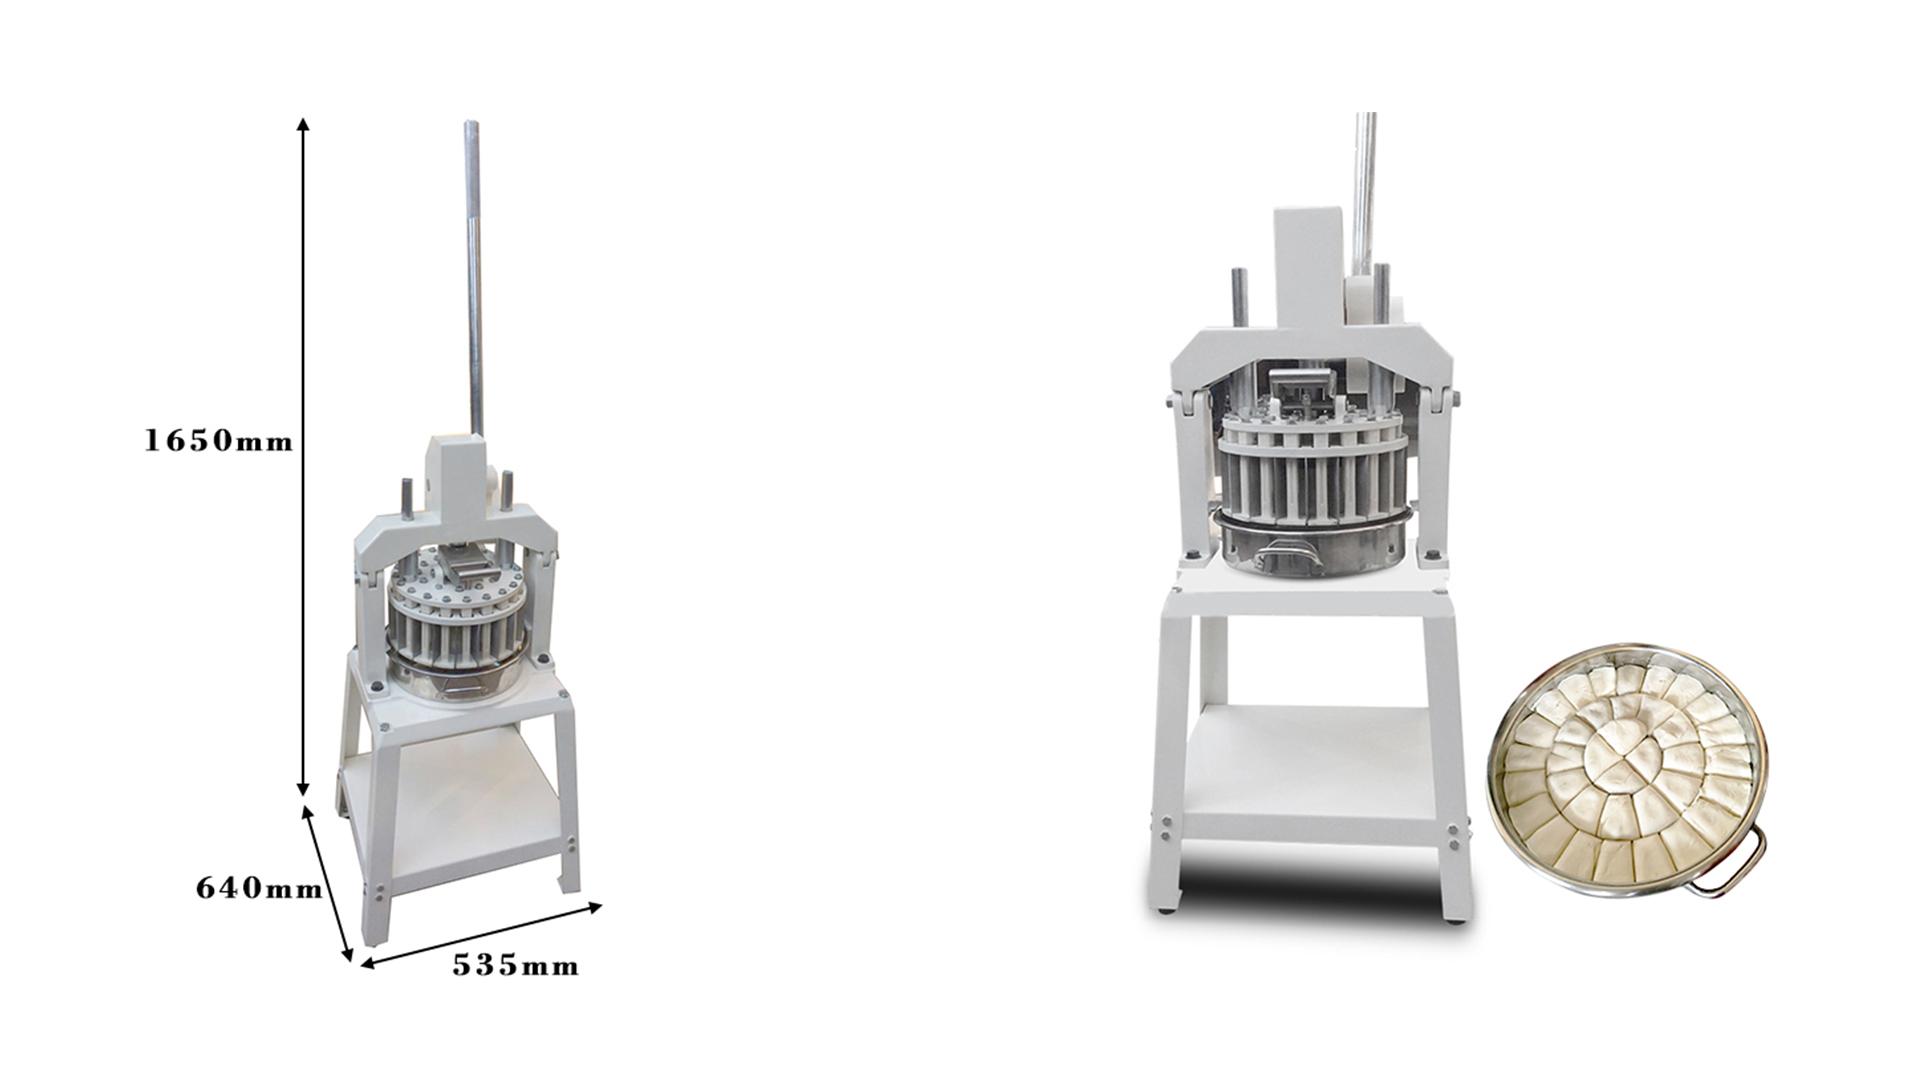 36 PCS Professional Cutting Bakery Machine Manual Dough Divider